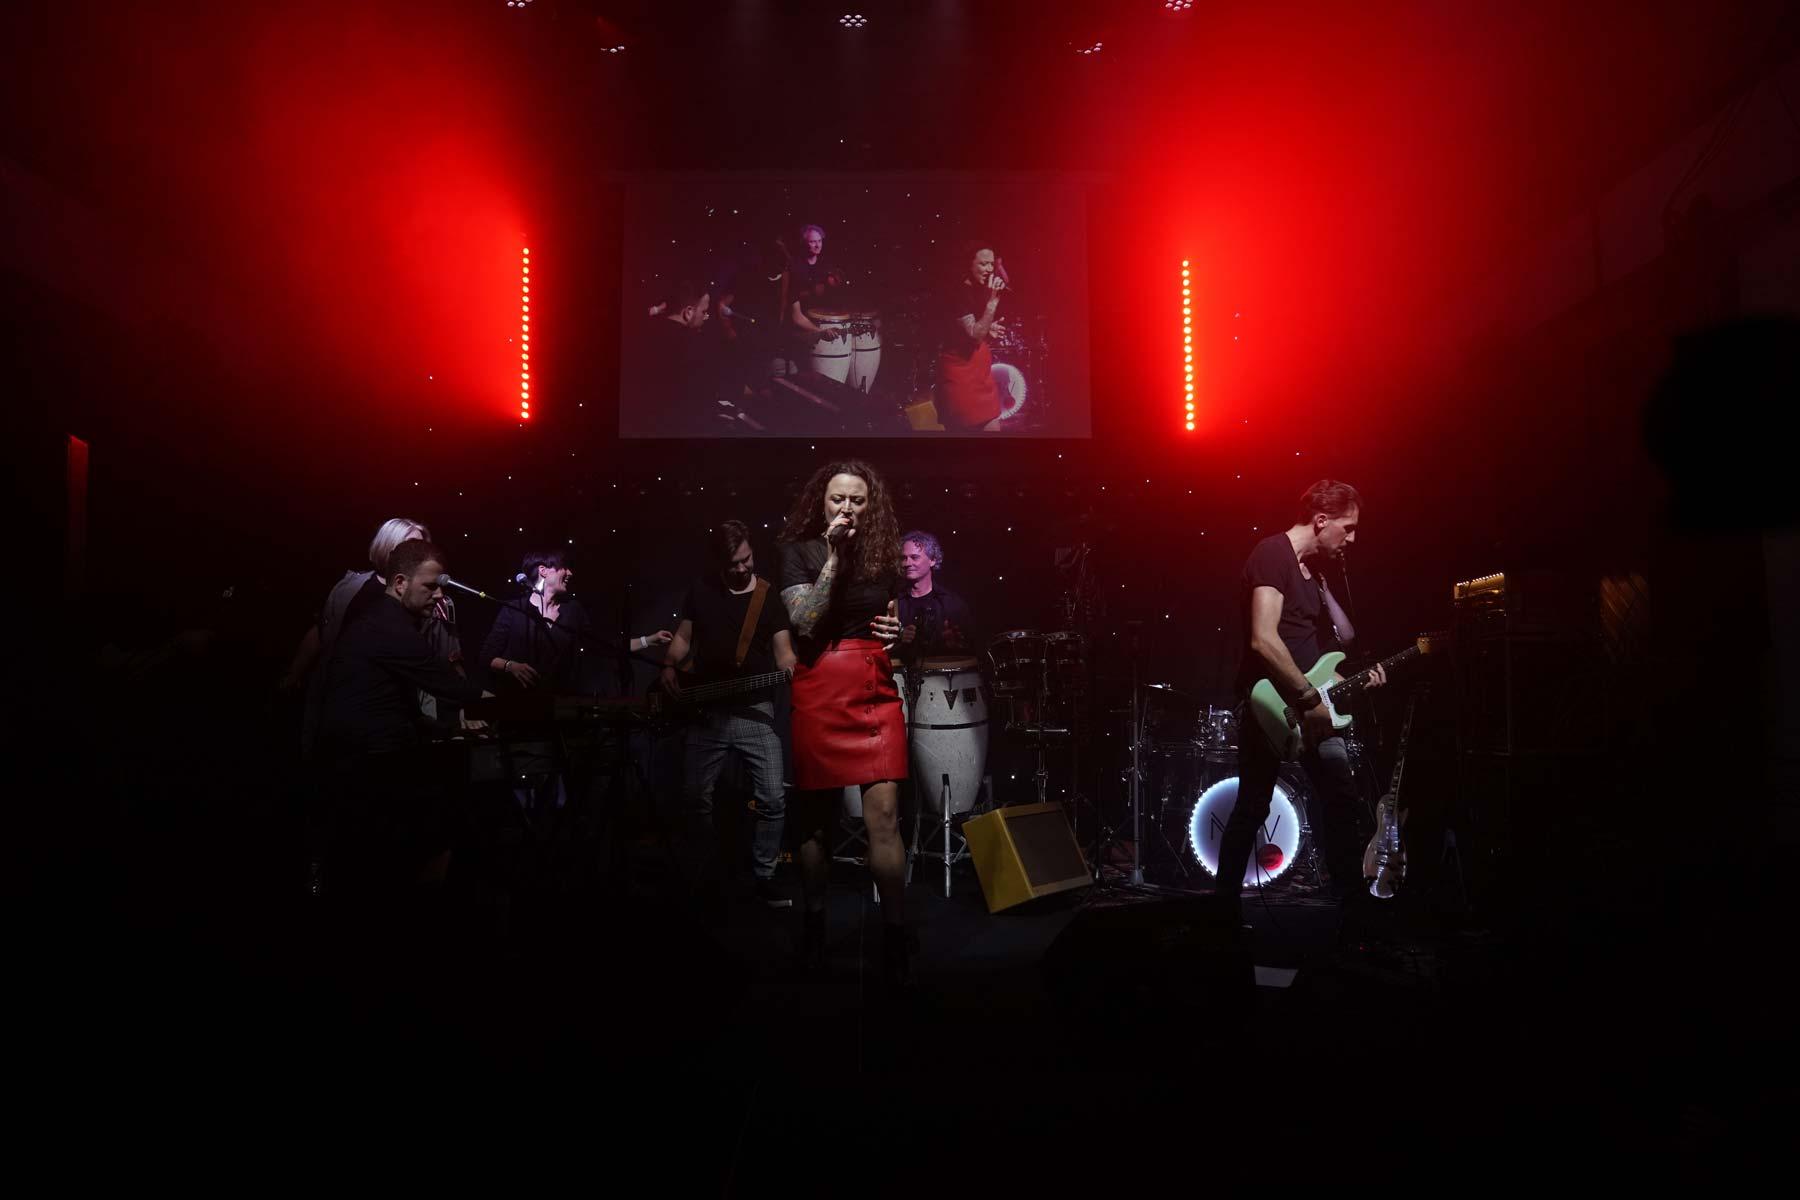 Nadine Wopp - Pop - Rock